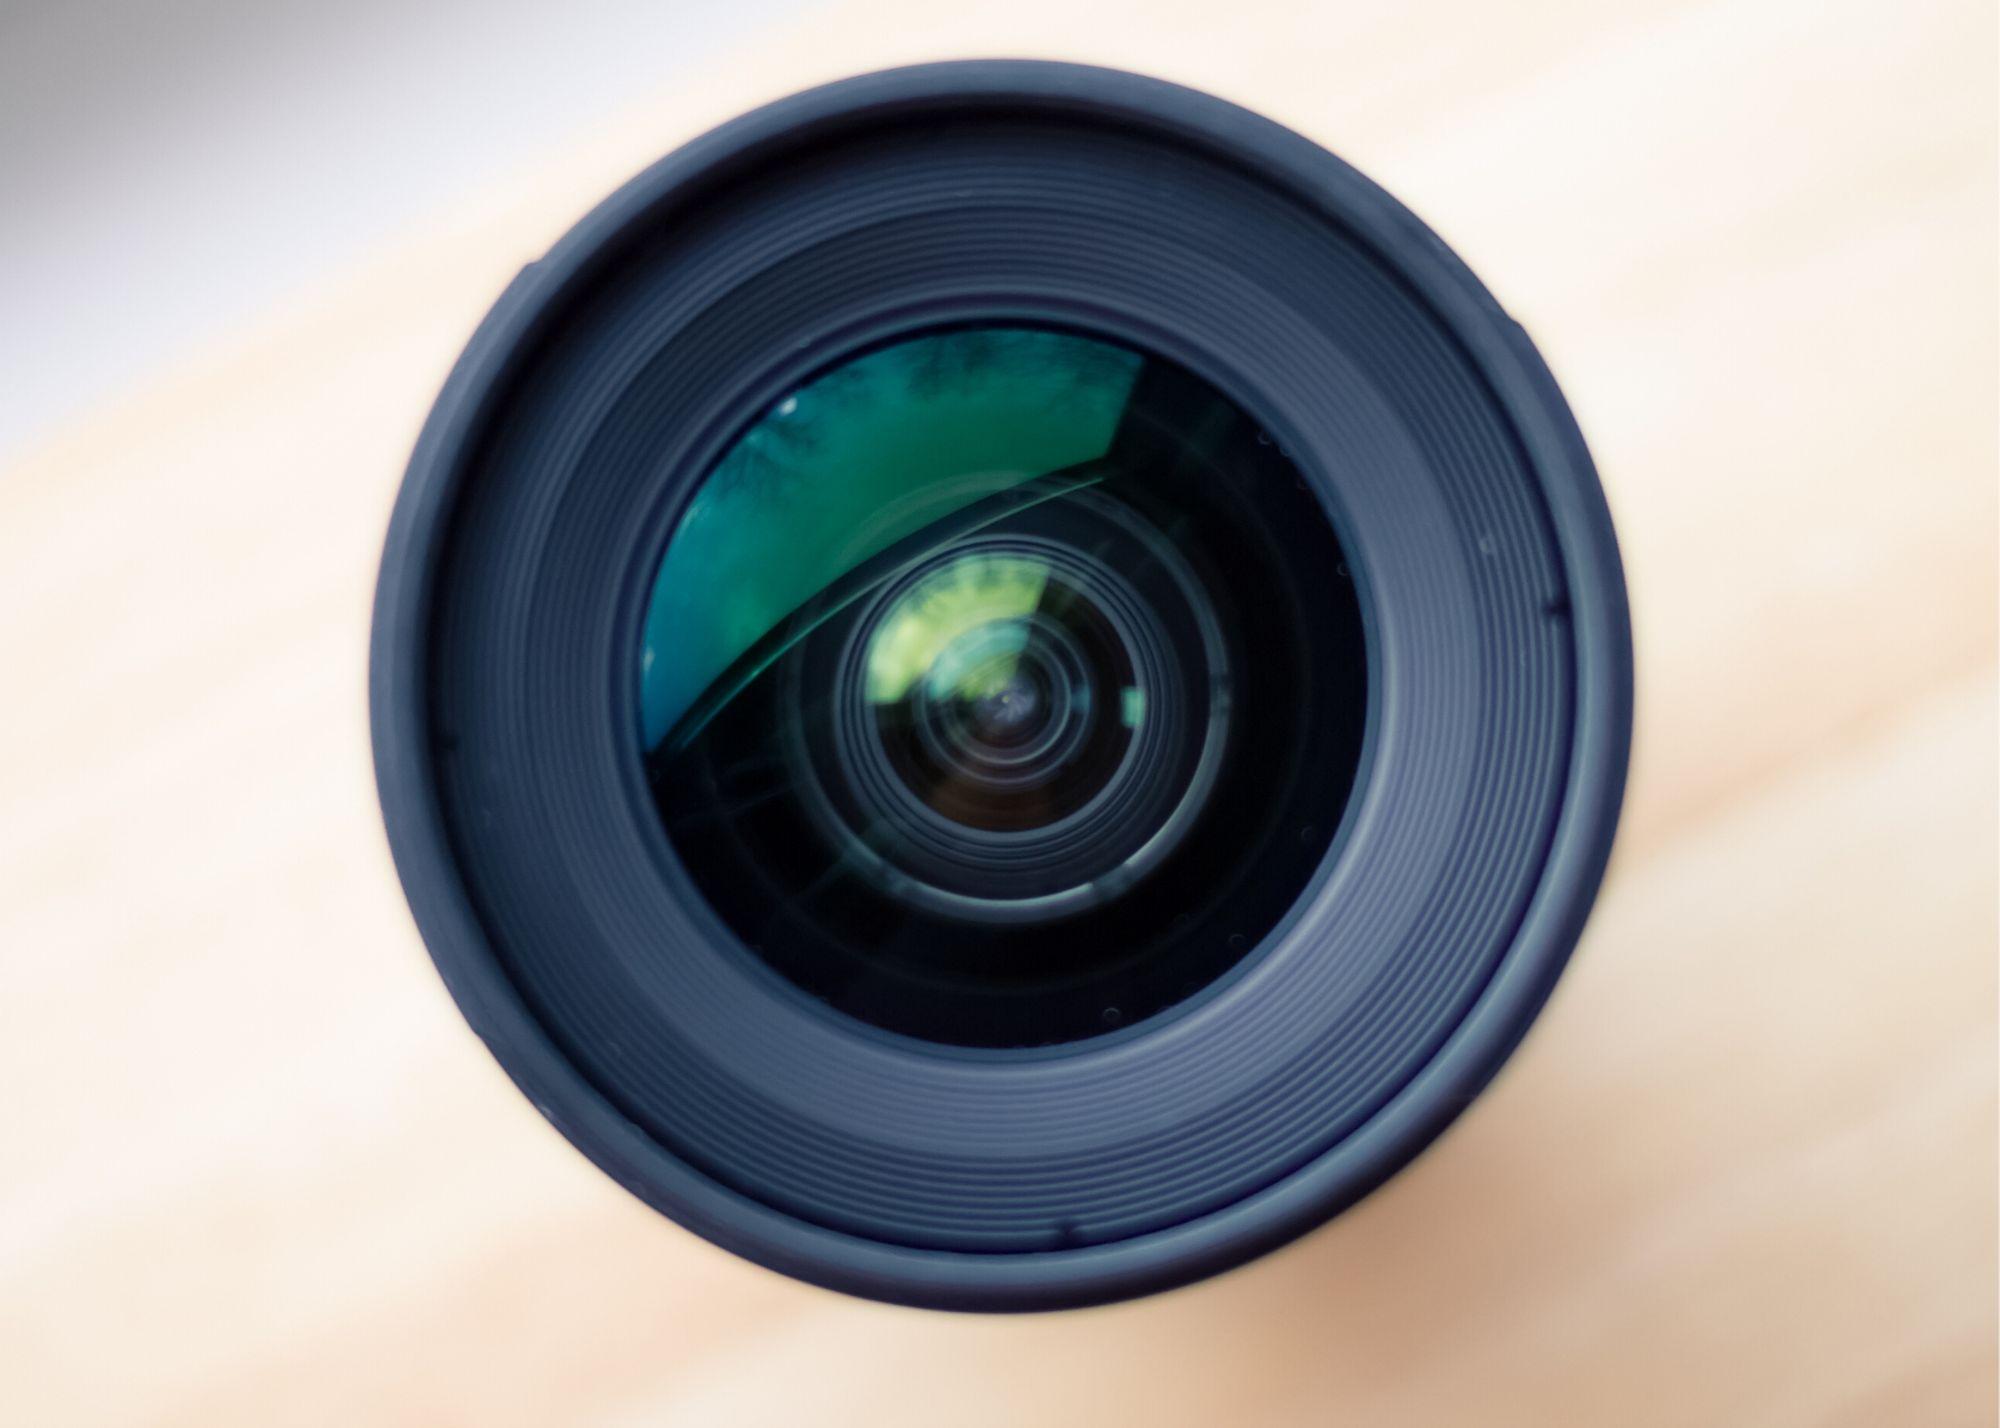 25 Blog Post Ideas For Photographers - Lens